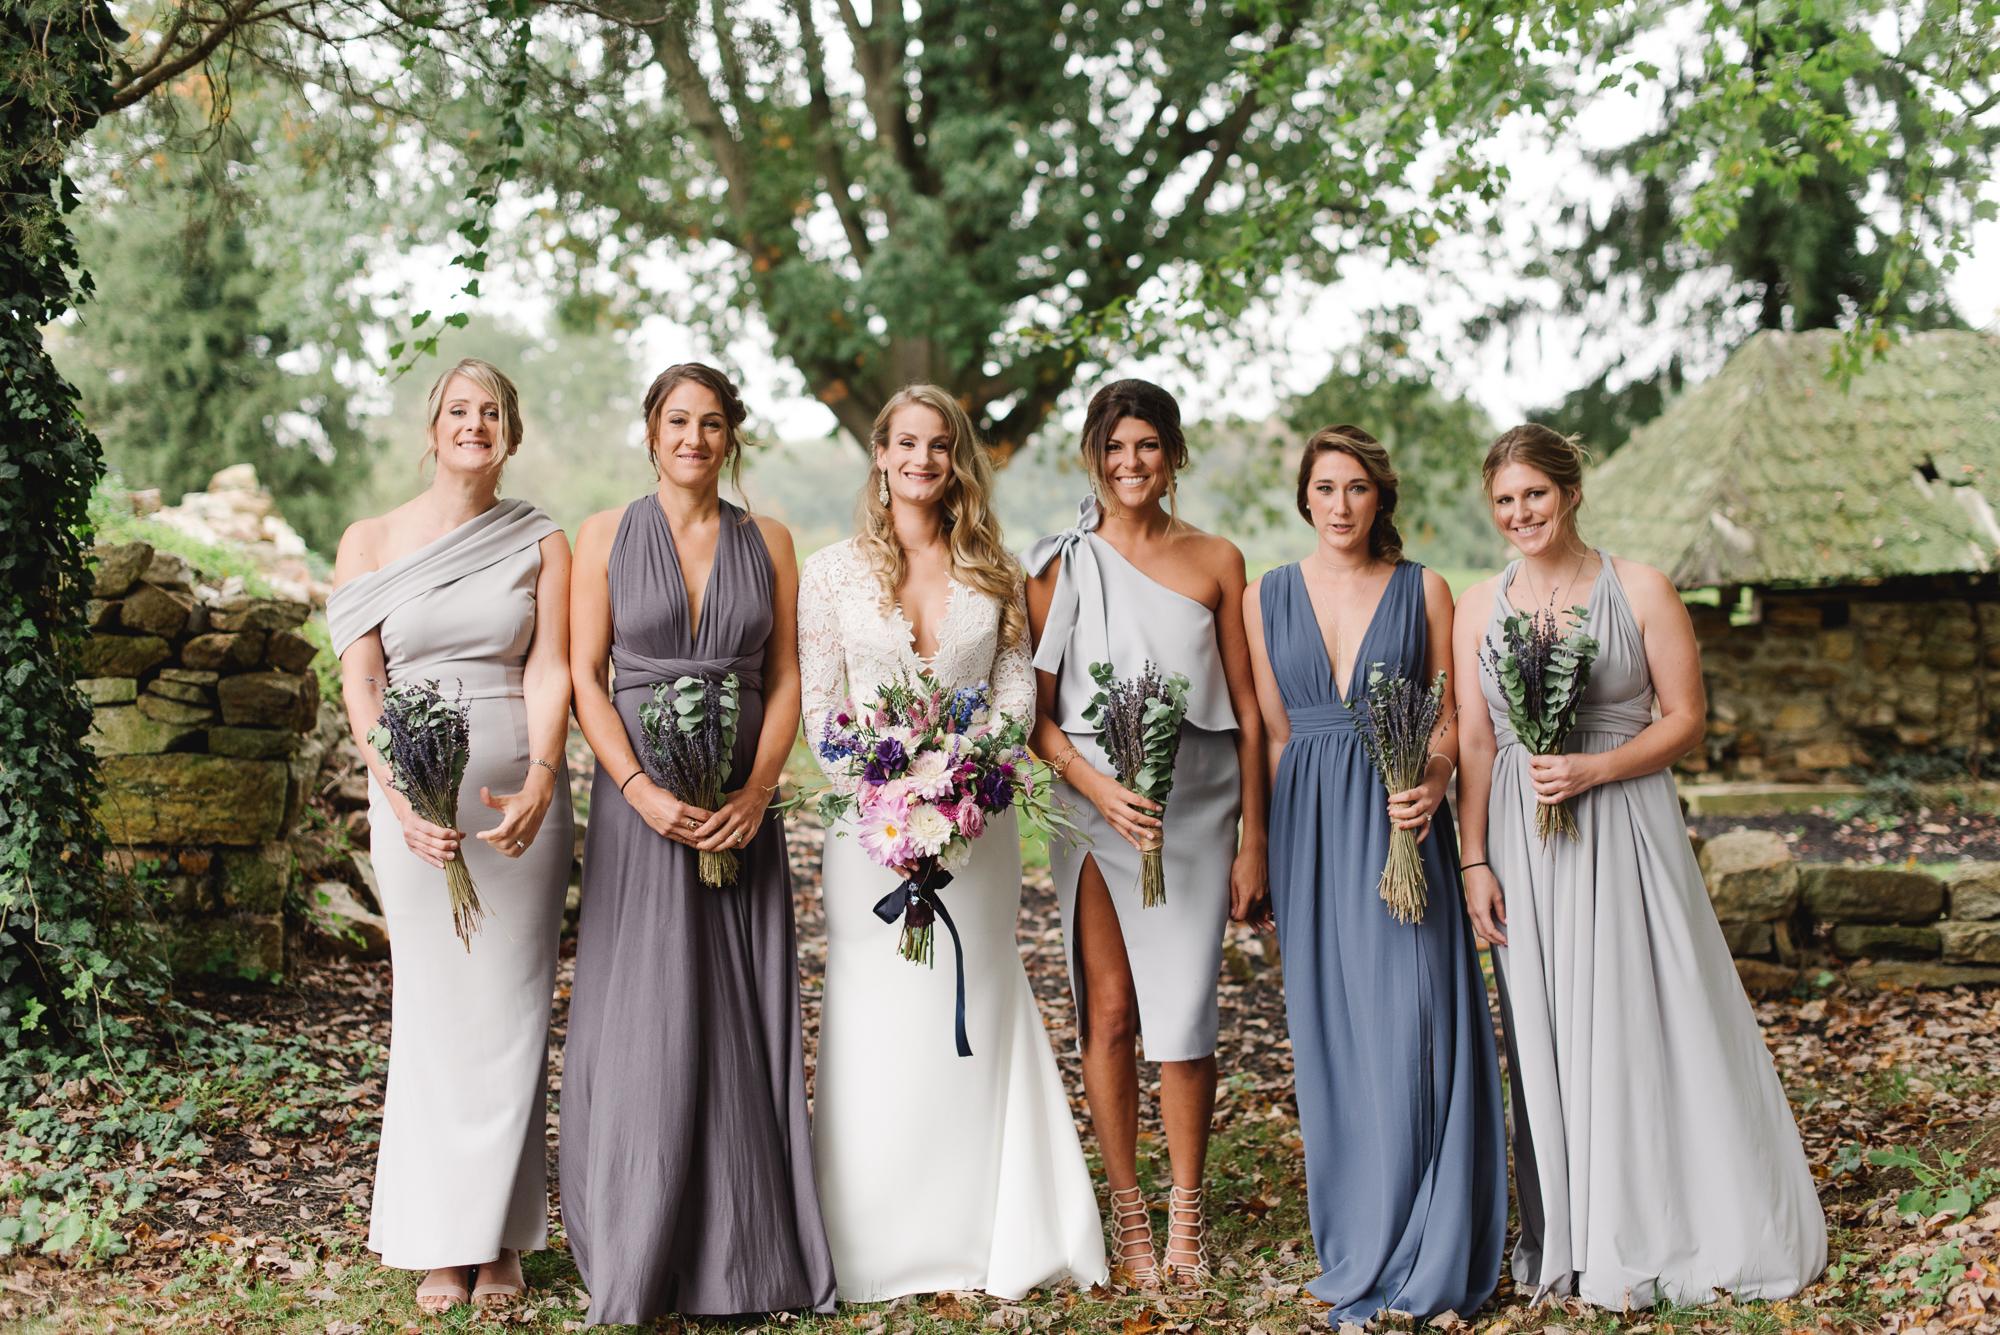 Deerfield-Country-Club-Wedding-DE-Delaware-Peaberry-Photography-PA-NJ-Wedding-Photographer-21.jpg